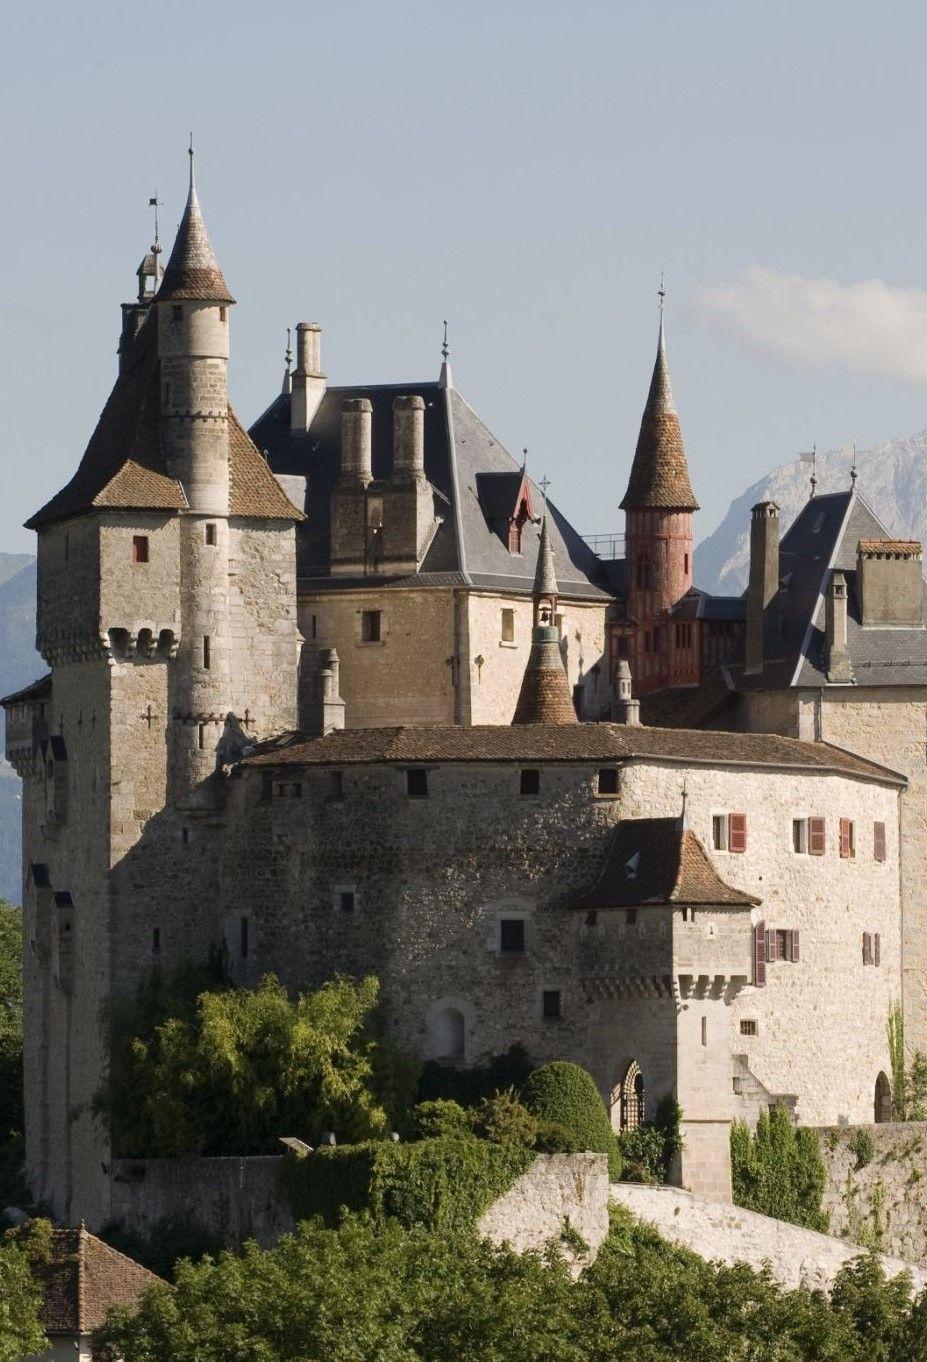 Château D Annecy With Images Medieval Castle